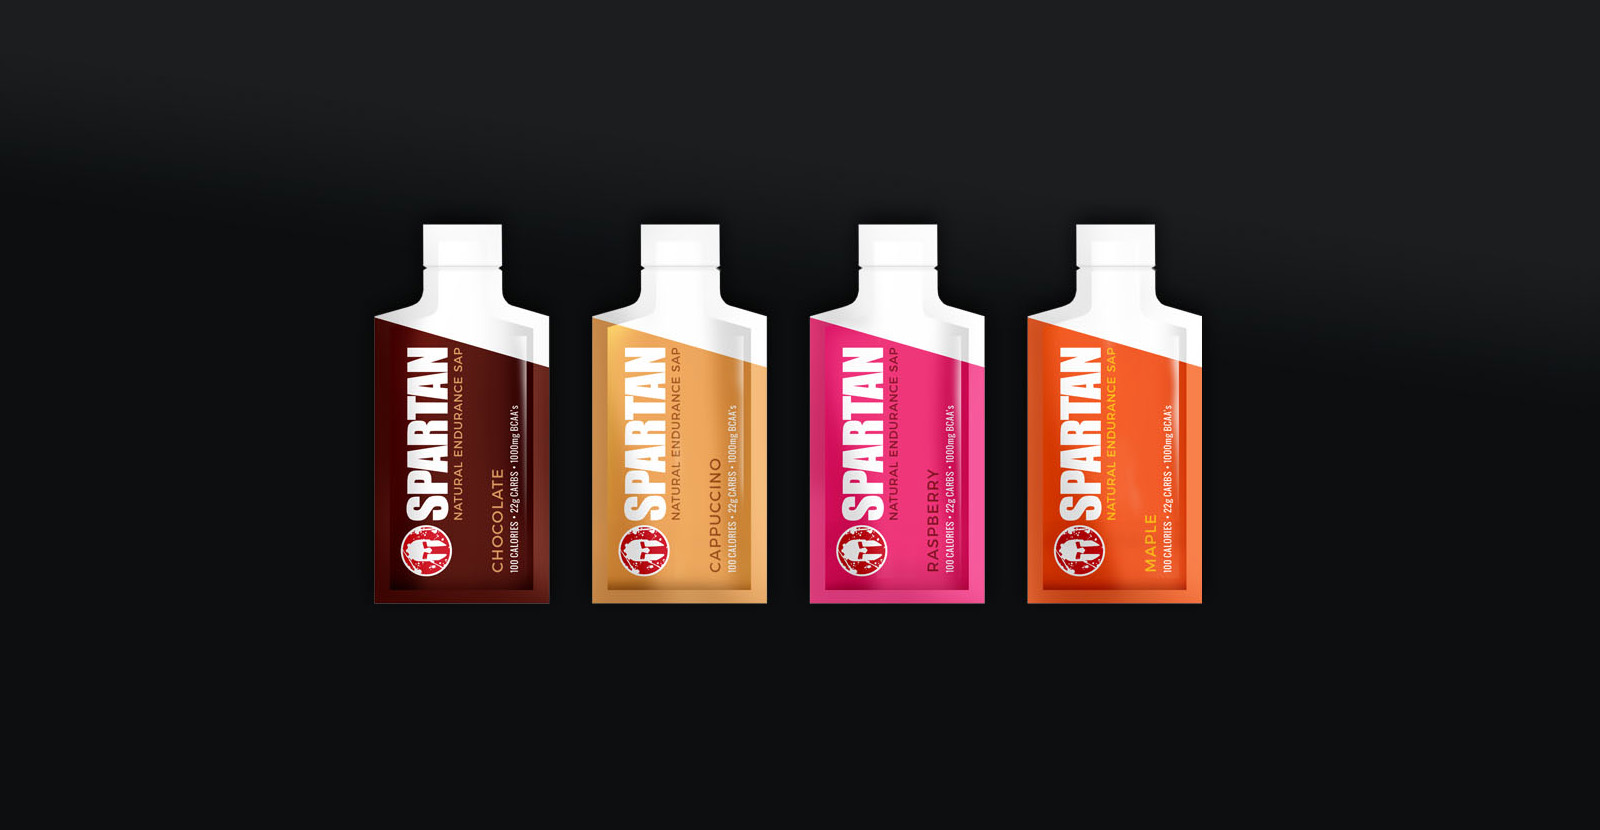 Orange County Brand Agency - Website Design - Packaging Design Agency